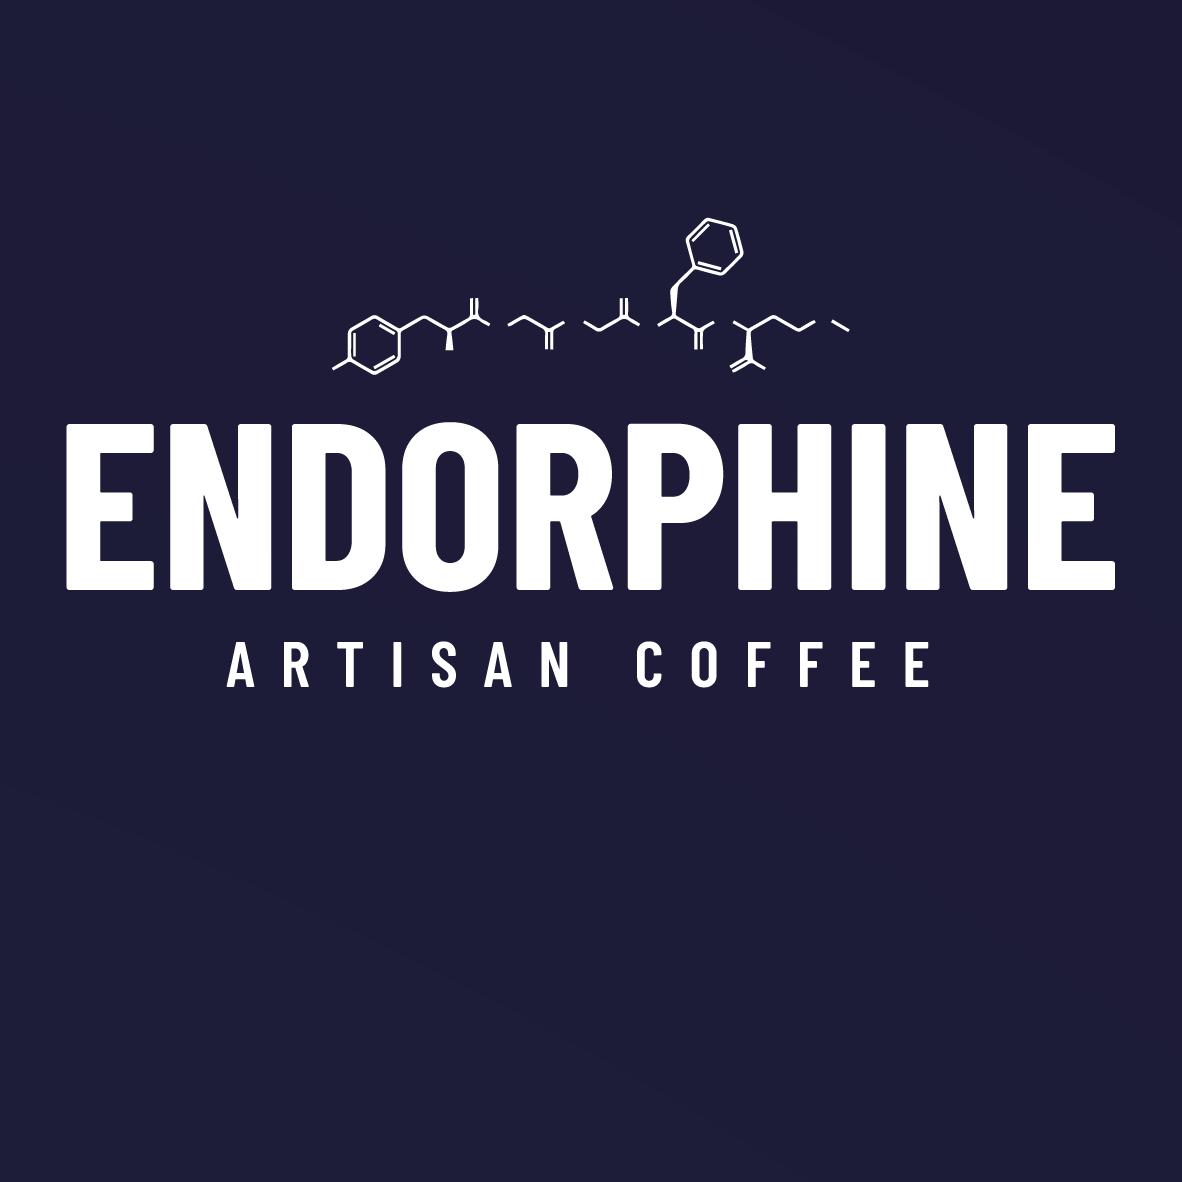 endorphine-logo-boxed-10